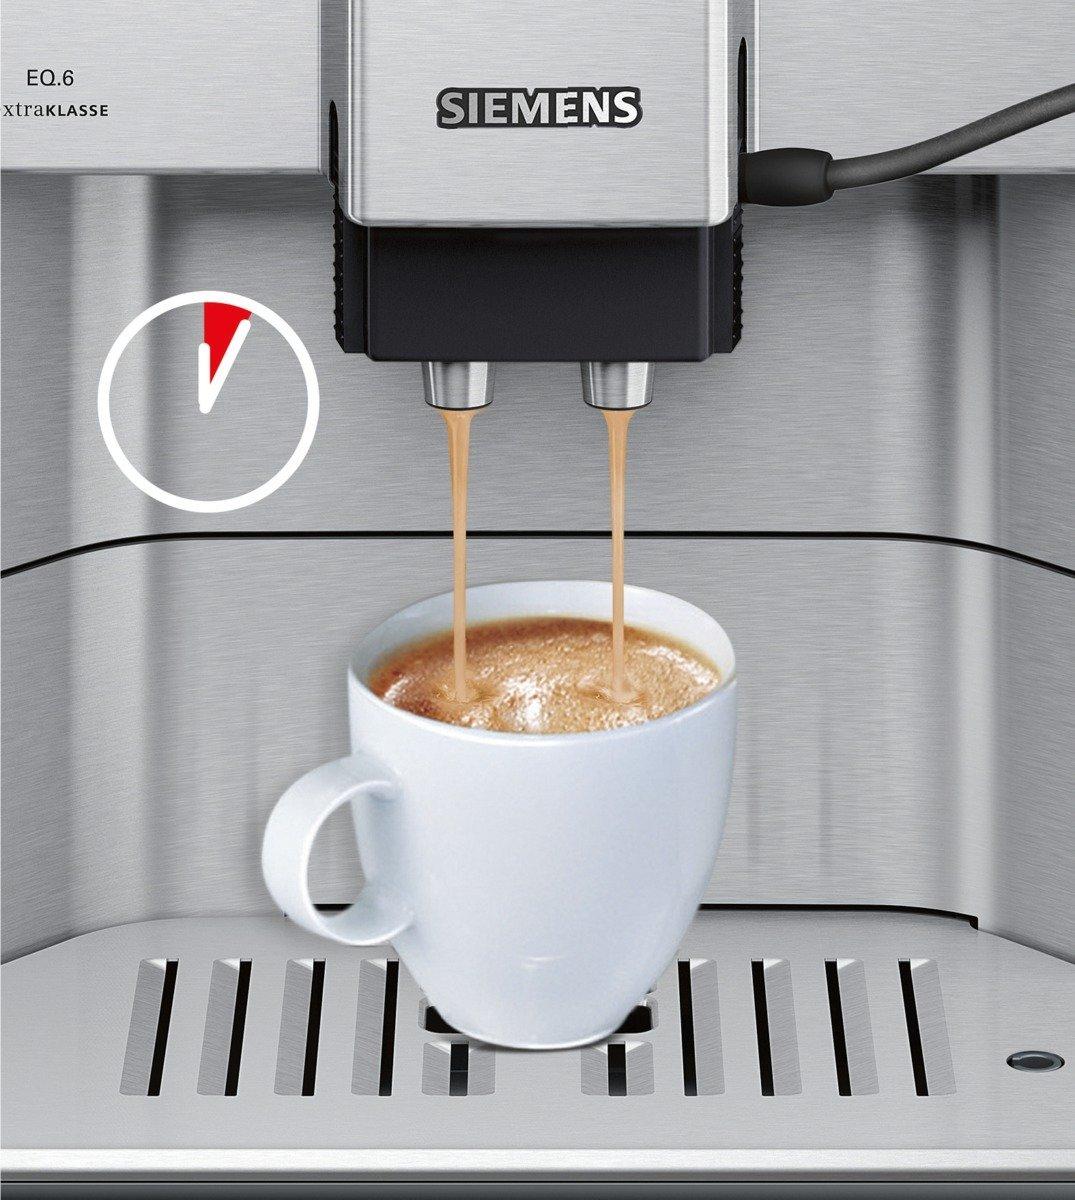 Siemens EQ.6